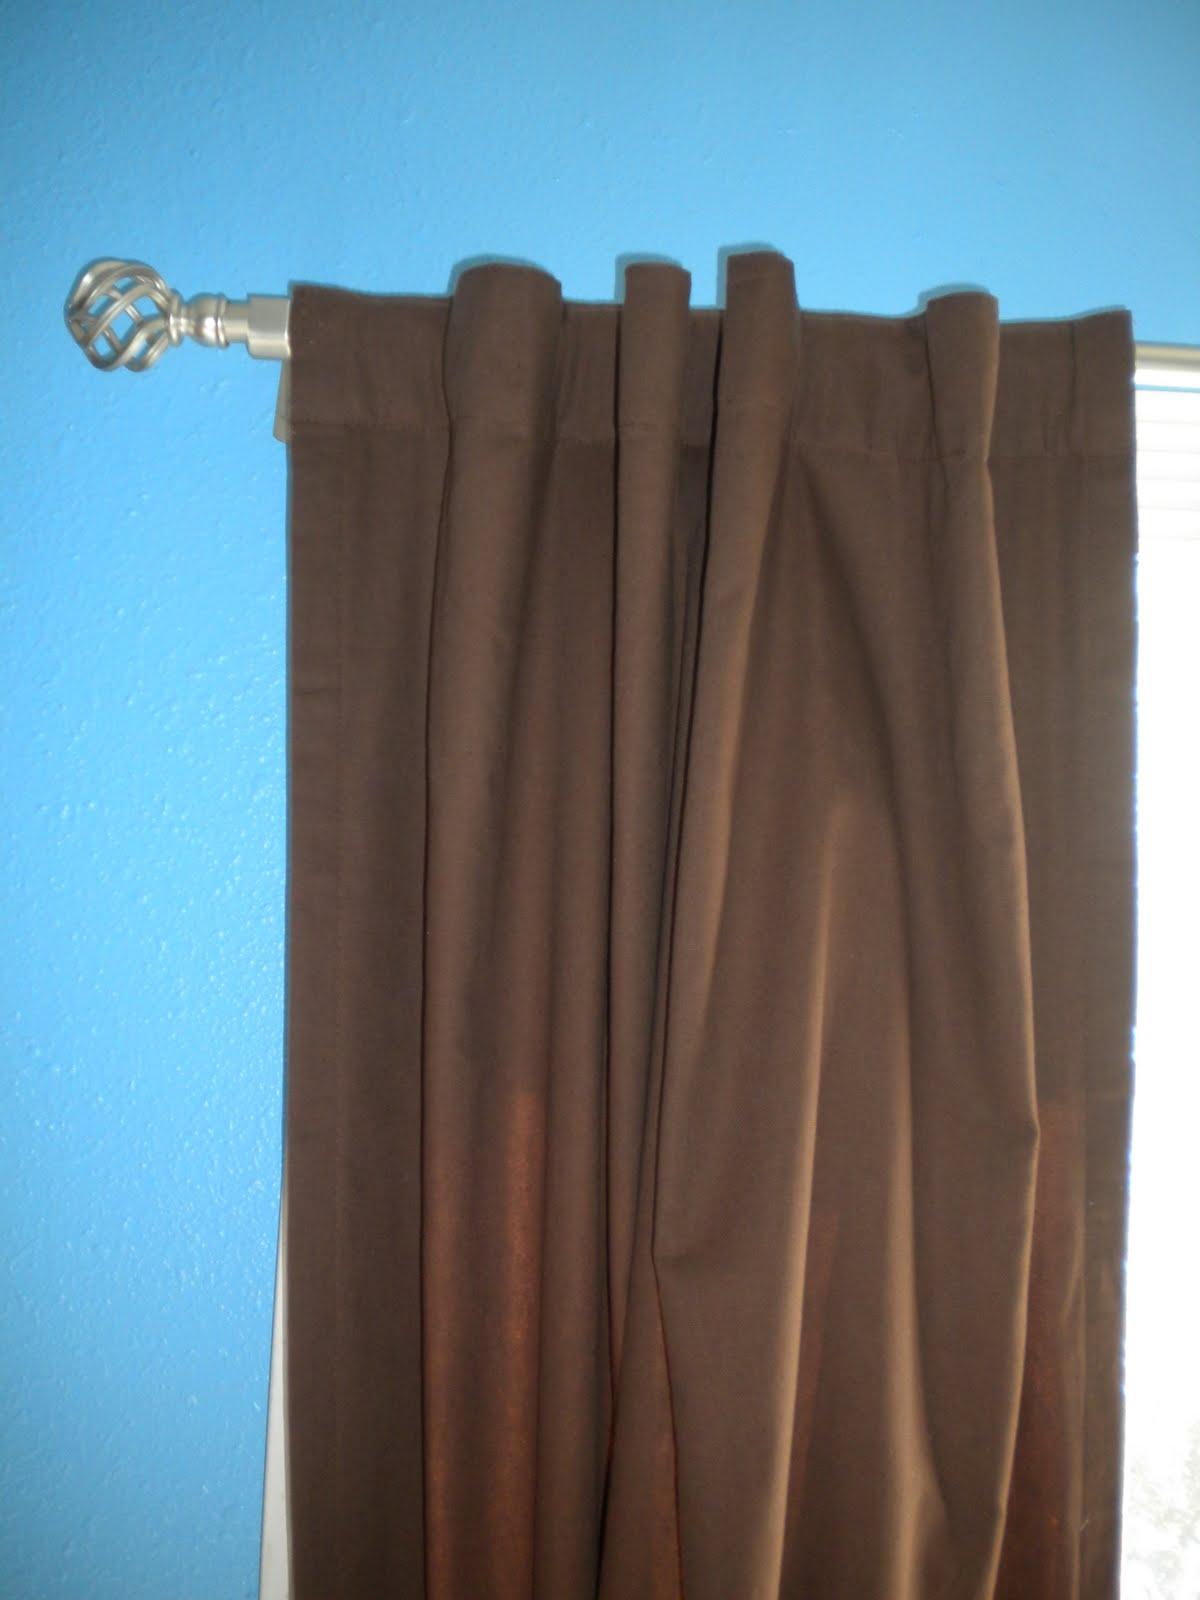 Diy wednesday revamp rod pocket curtains